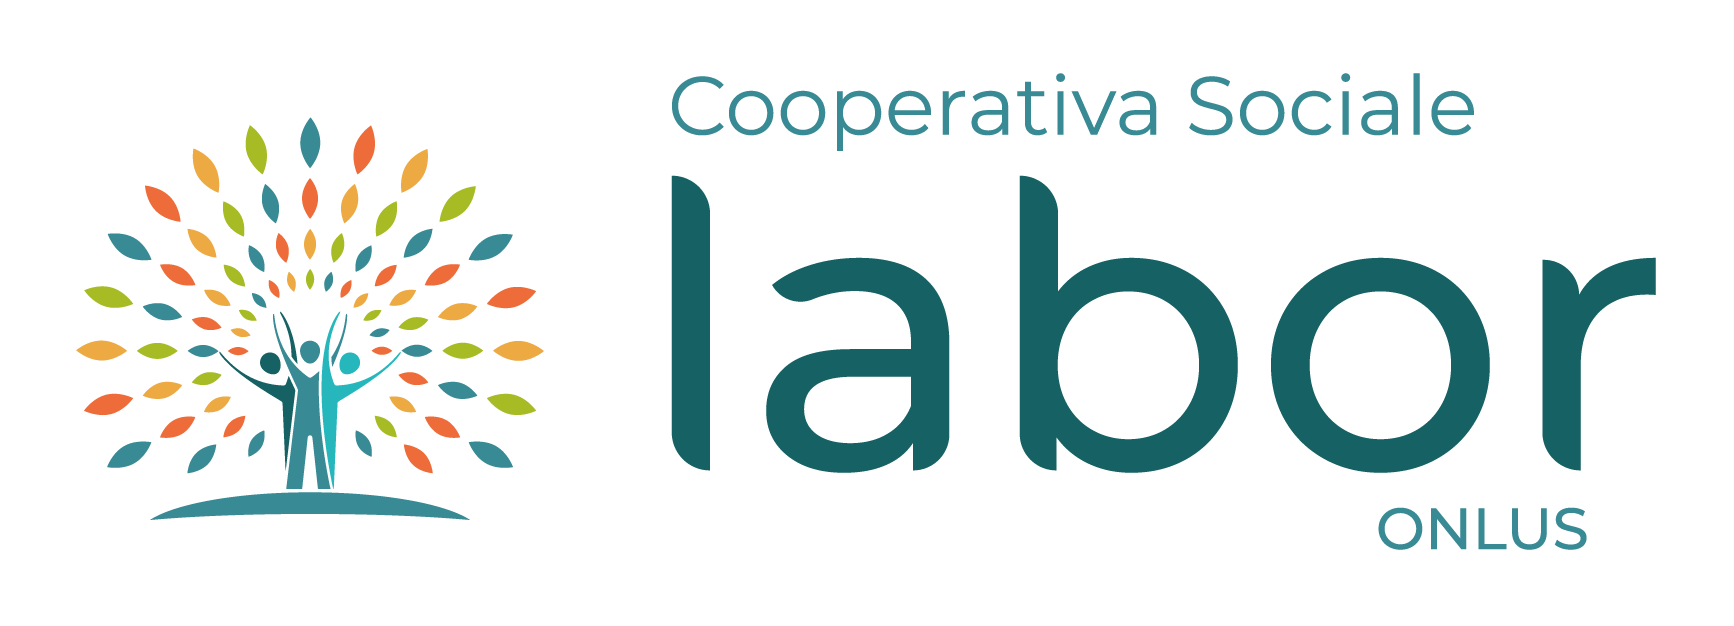 Cooperativa Labor